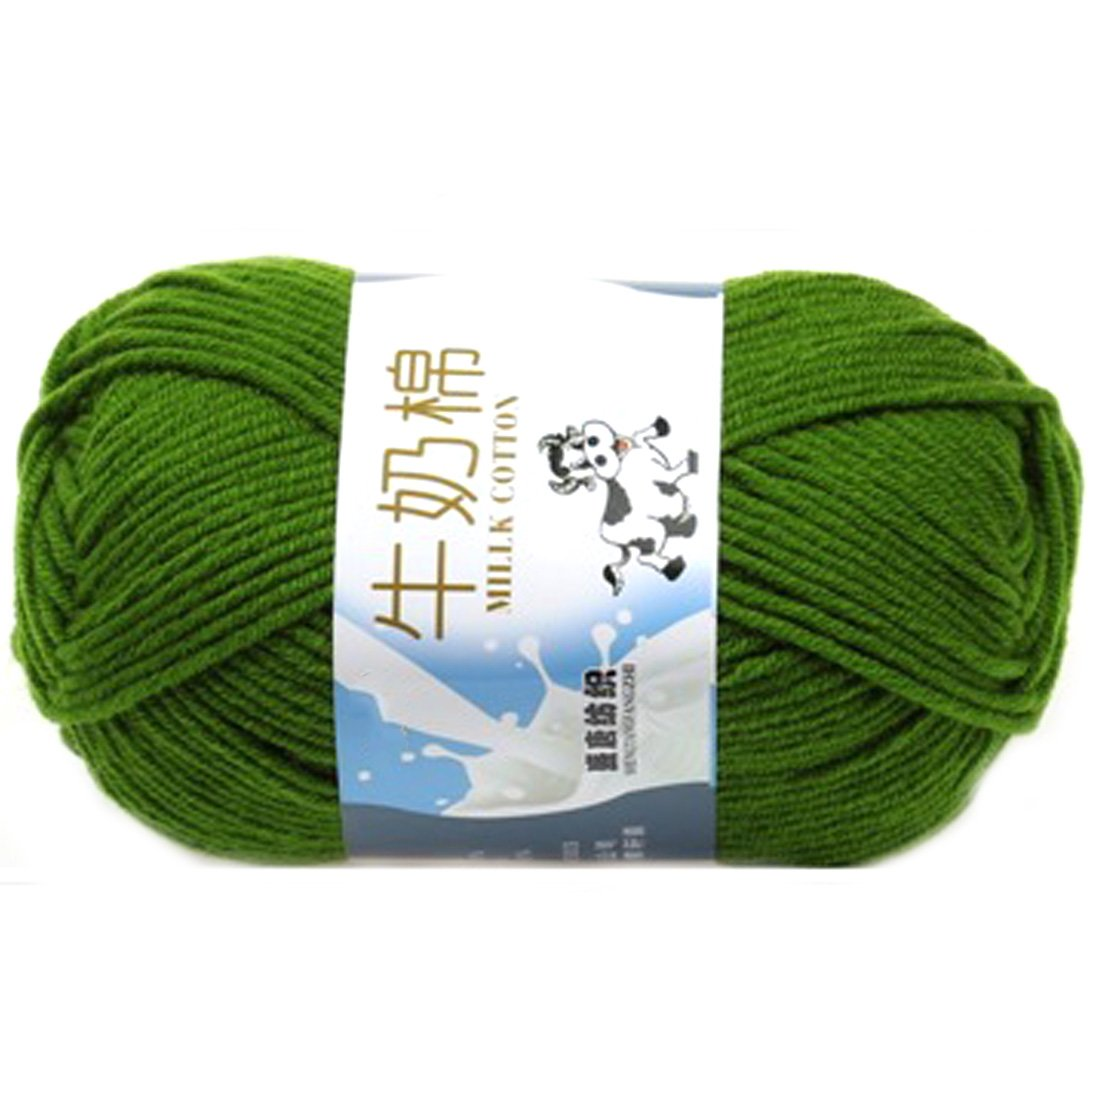 Colours May Vary DDLBiZ Pompom Maker Fluff Ball Weaver DIY Knitting Craft Tool Kit